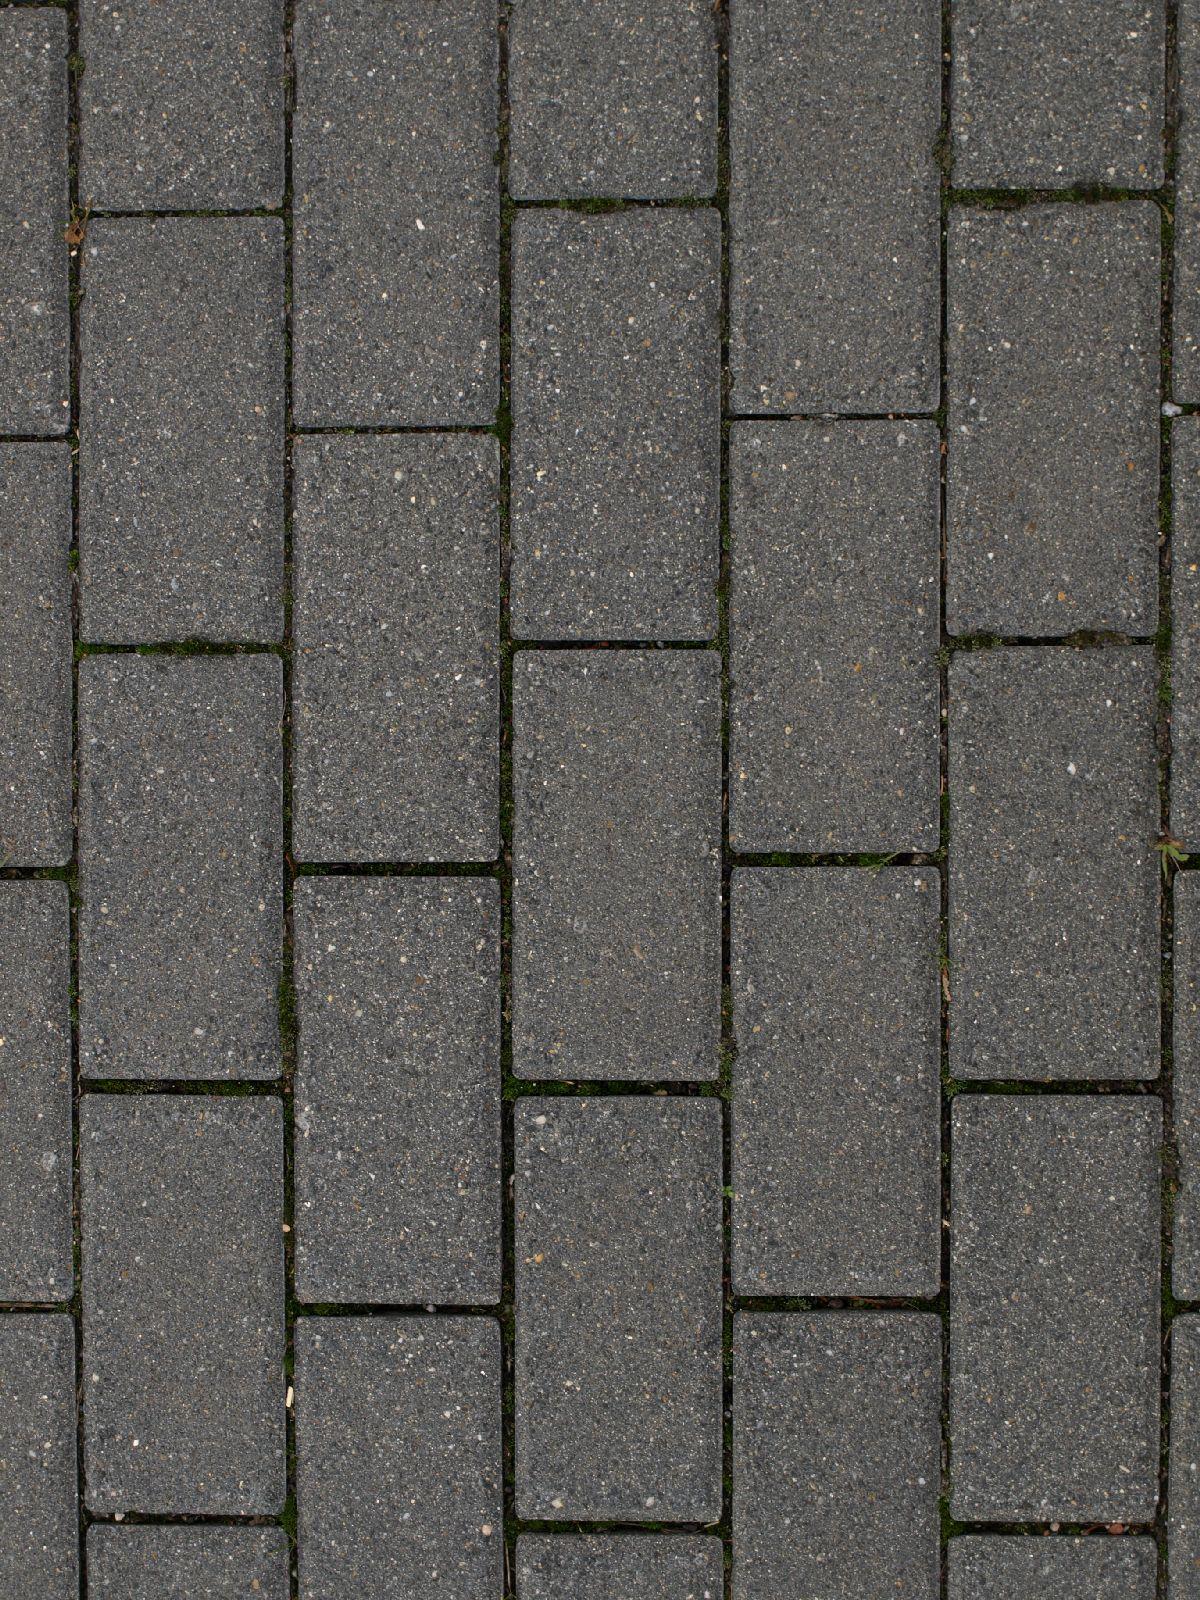 Boden-Gehweg-Strasse-Buergersteig-Textur_A_PA045739